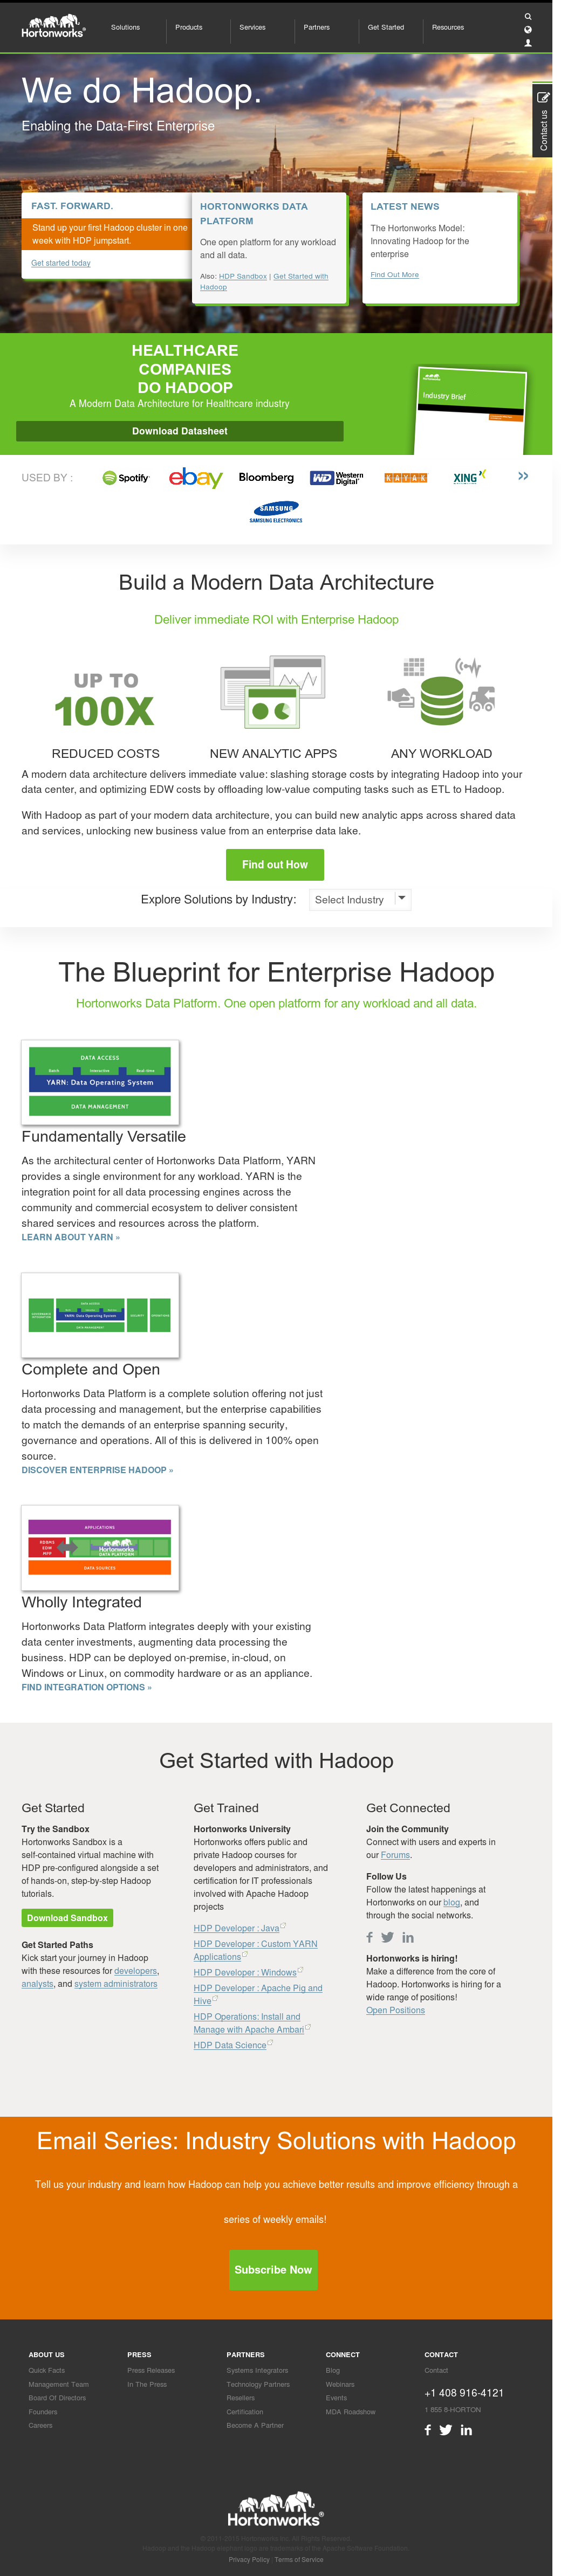 Owler Reports - HortonWorks Blog Change Data Capture using Apache NiFi